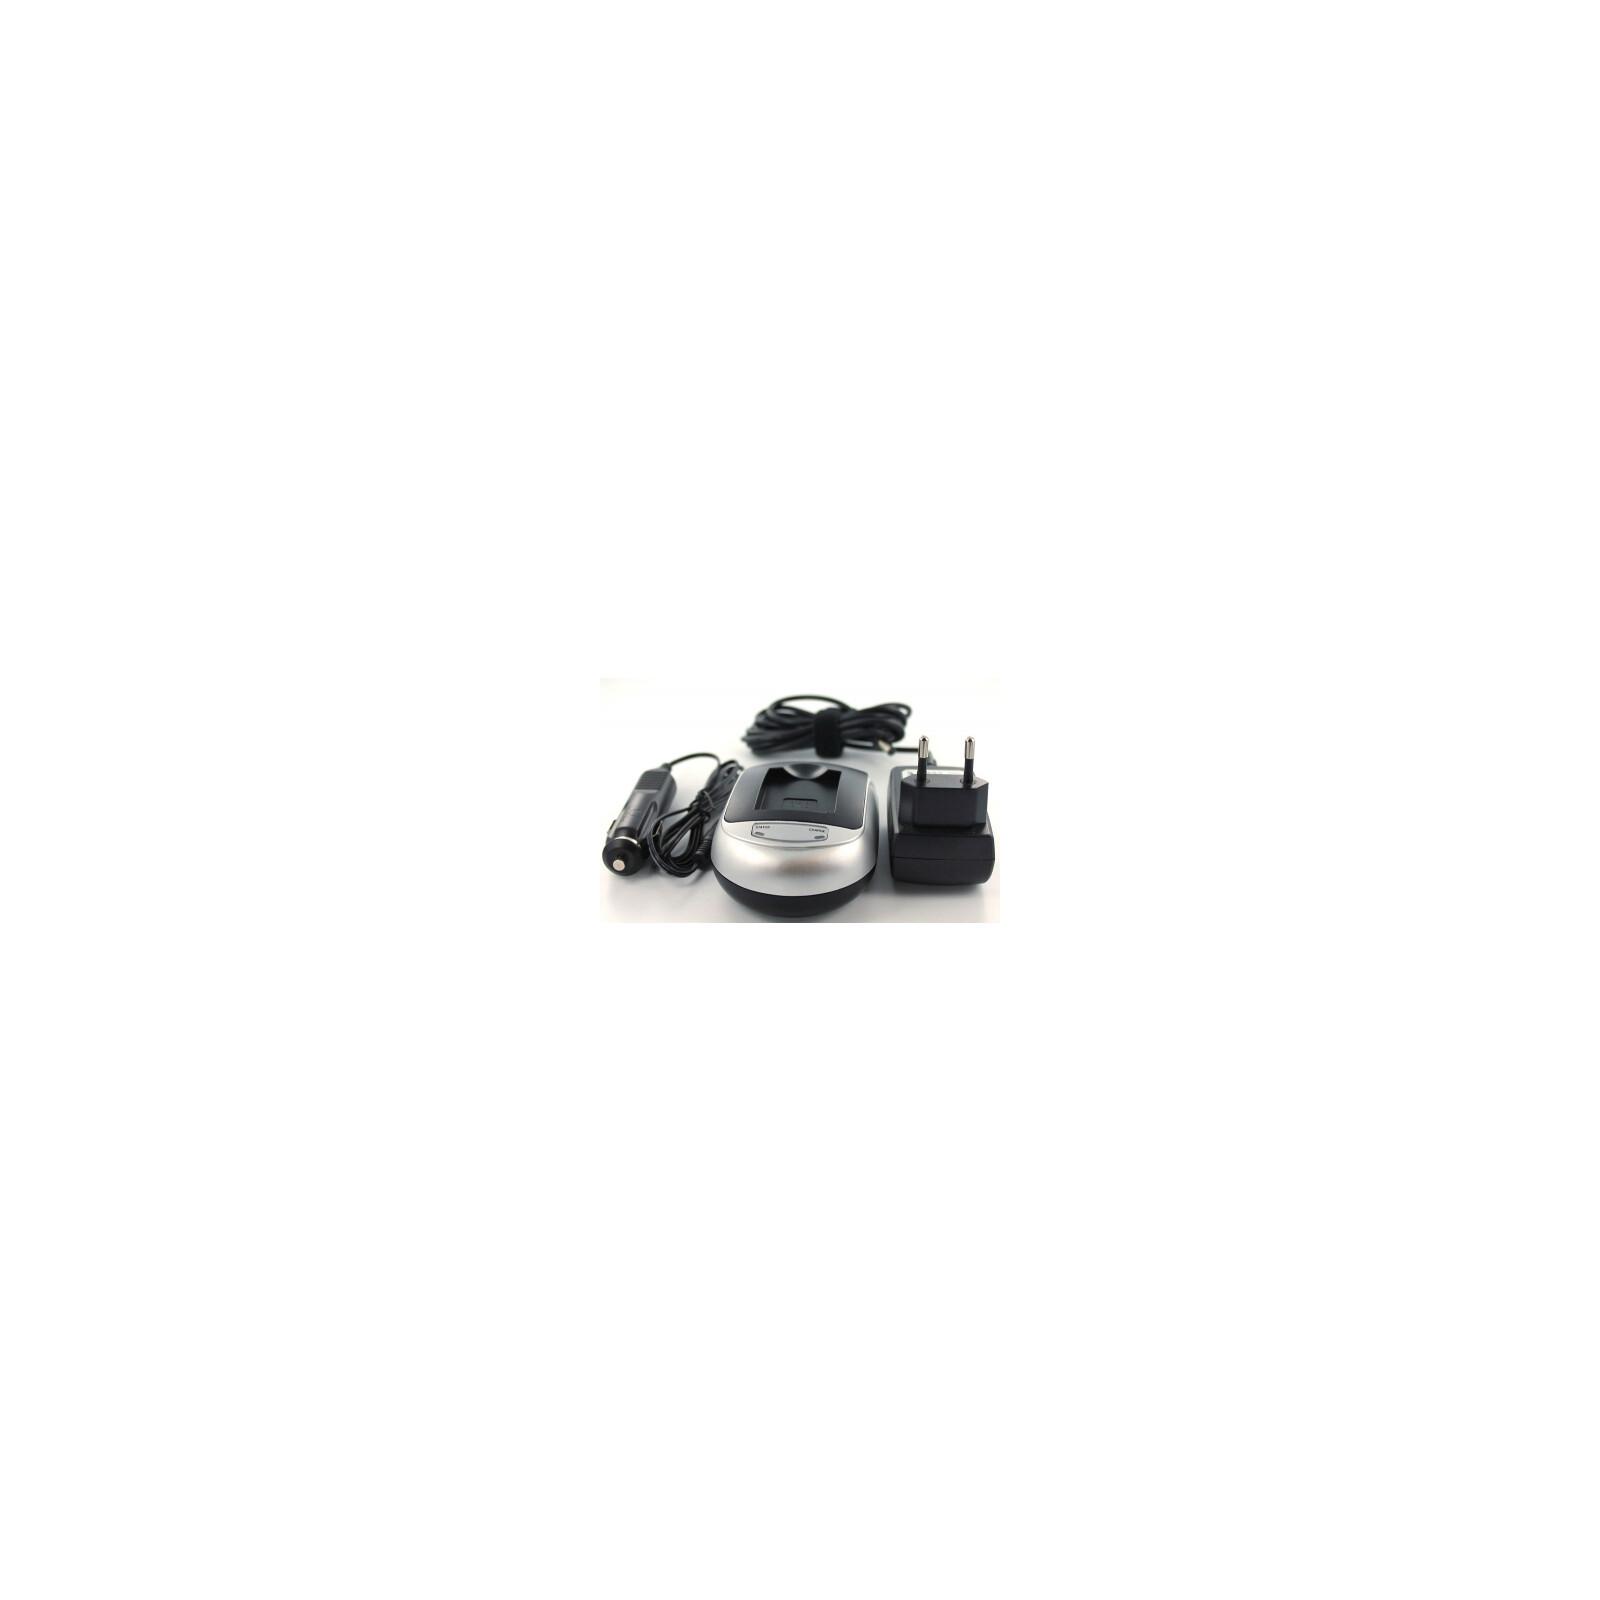 AGI 11734 Ladegerät Nikon Coolpix S31